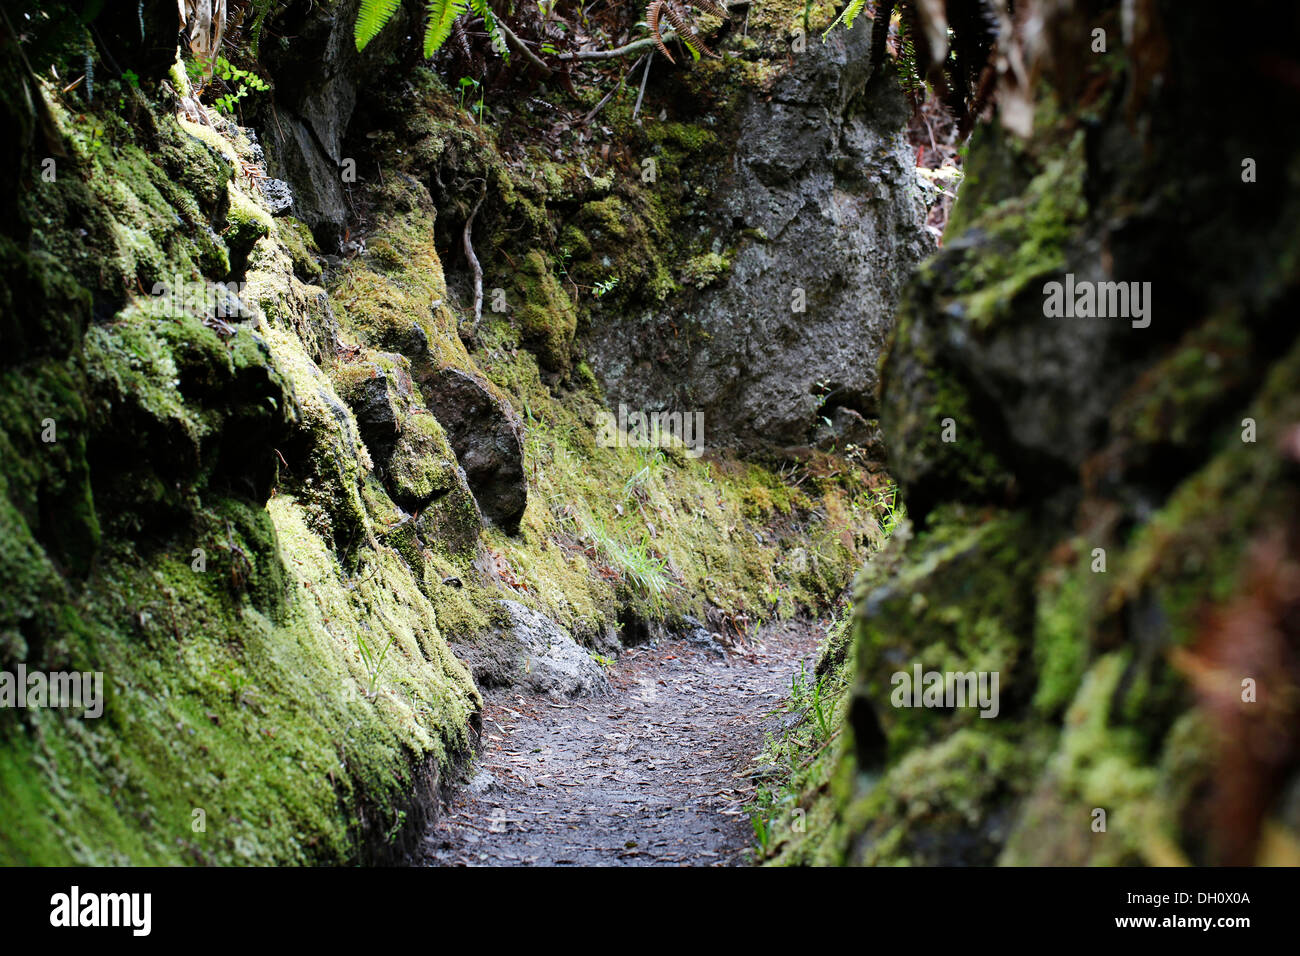 Narrowing of the path, Halemaumau Trail 'Into the Volcano', down into the caldera, Kilauea Volcano - Stock Image